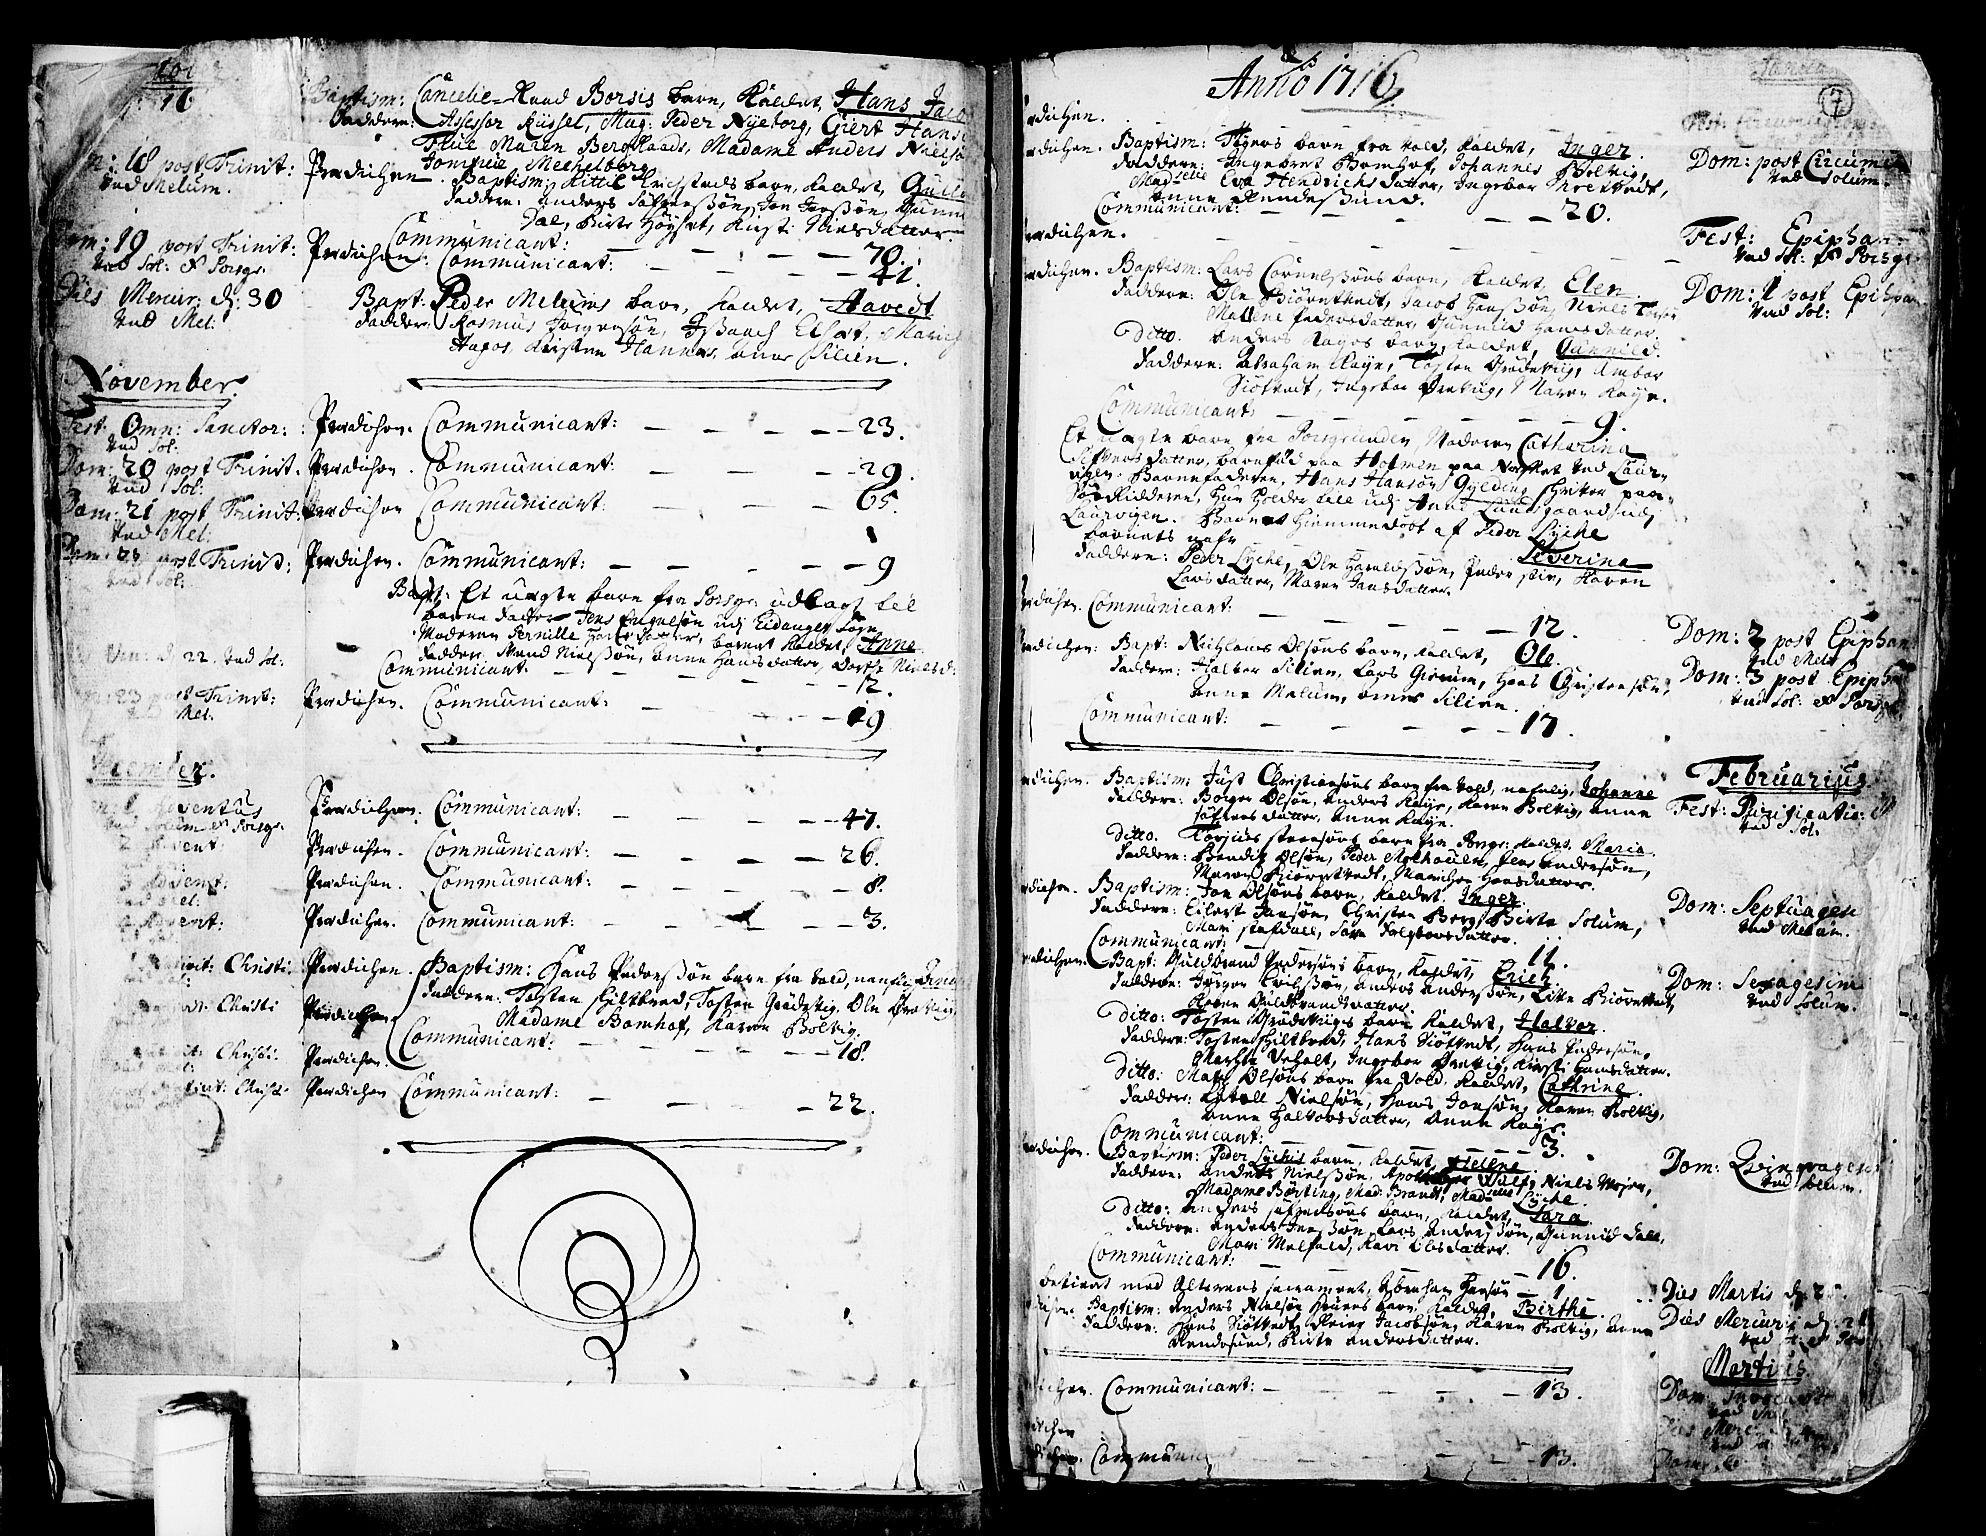 SAKO, Solum kirkebøker, F/Fa/L0002: Ministerialbok nr. I 2, 1713-1761, s. 7